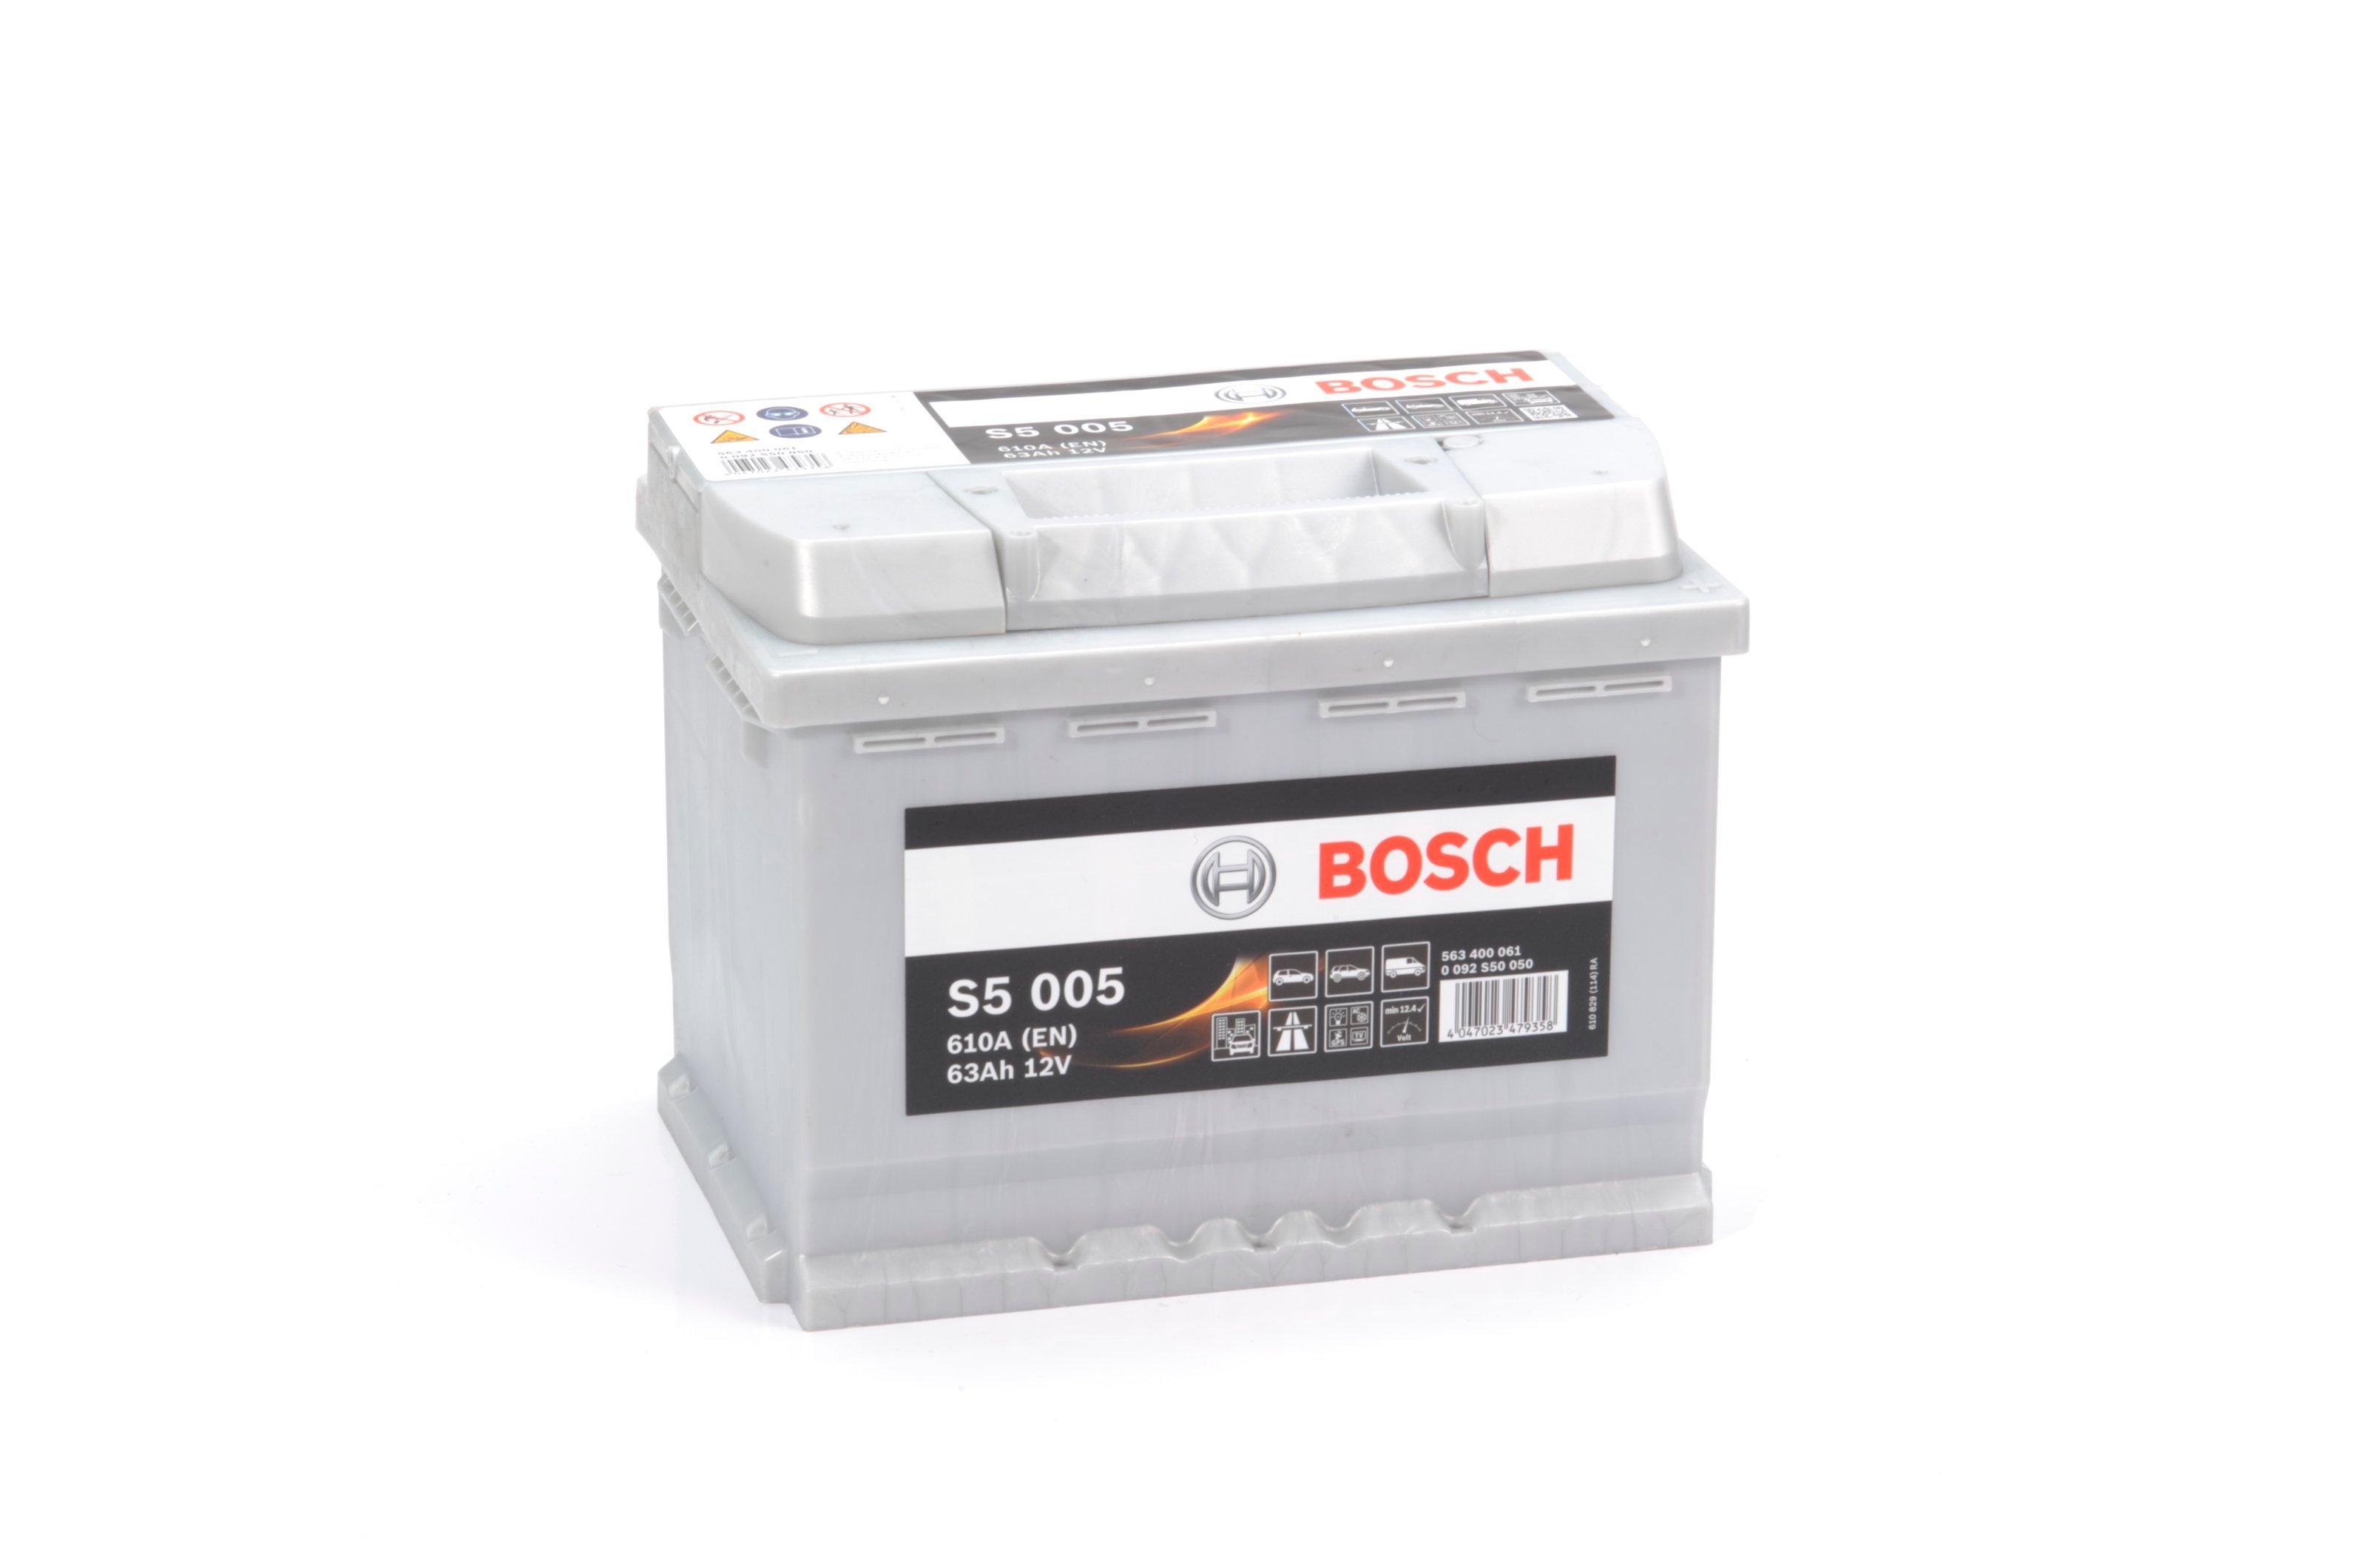 Батарея аккумуляторная Bosch S5 005 12В 63Ач 610A(EN) R+ Bosch 0 092 S50 050 - фото 7